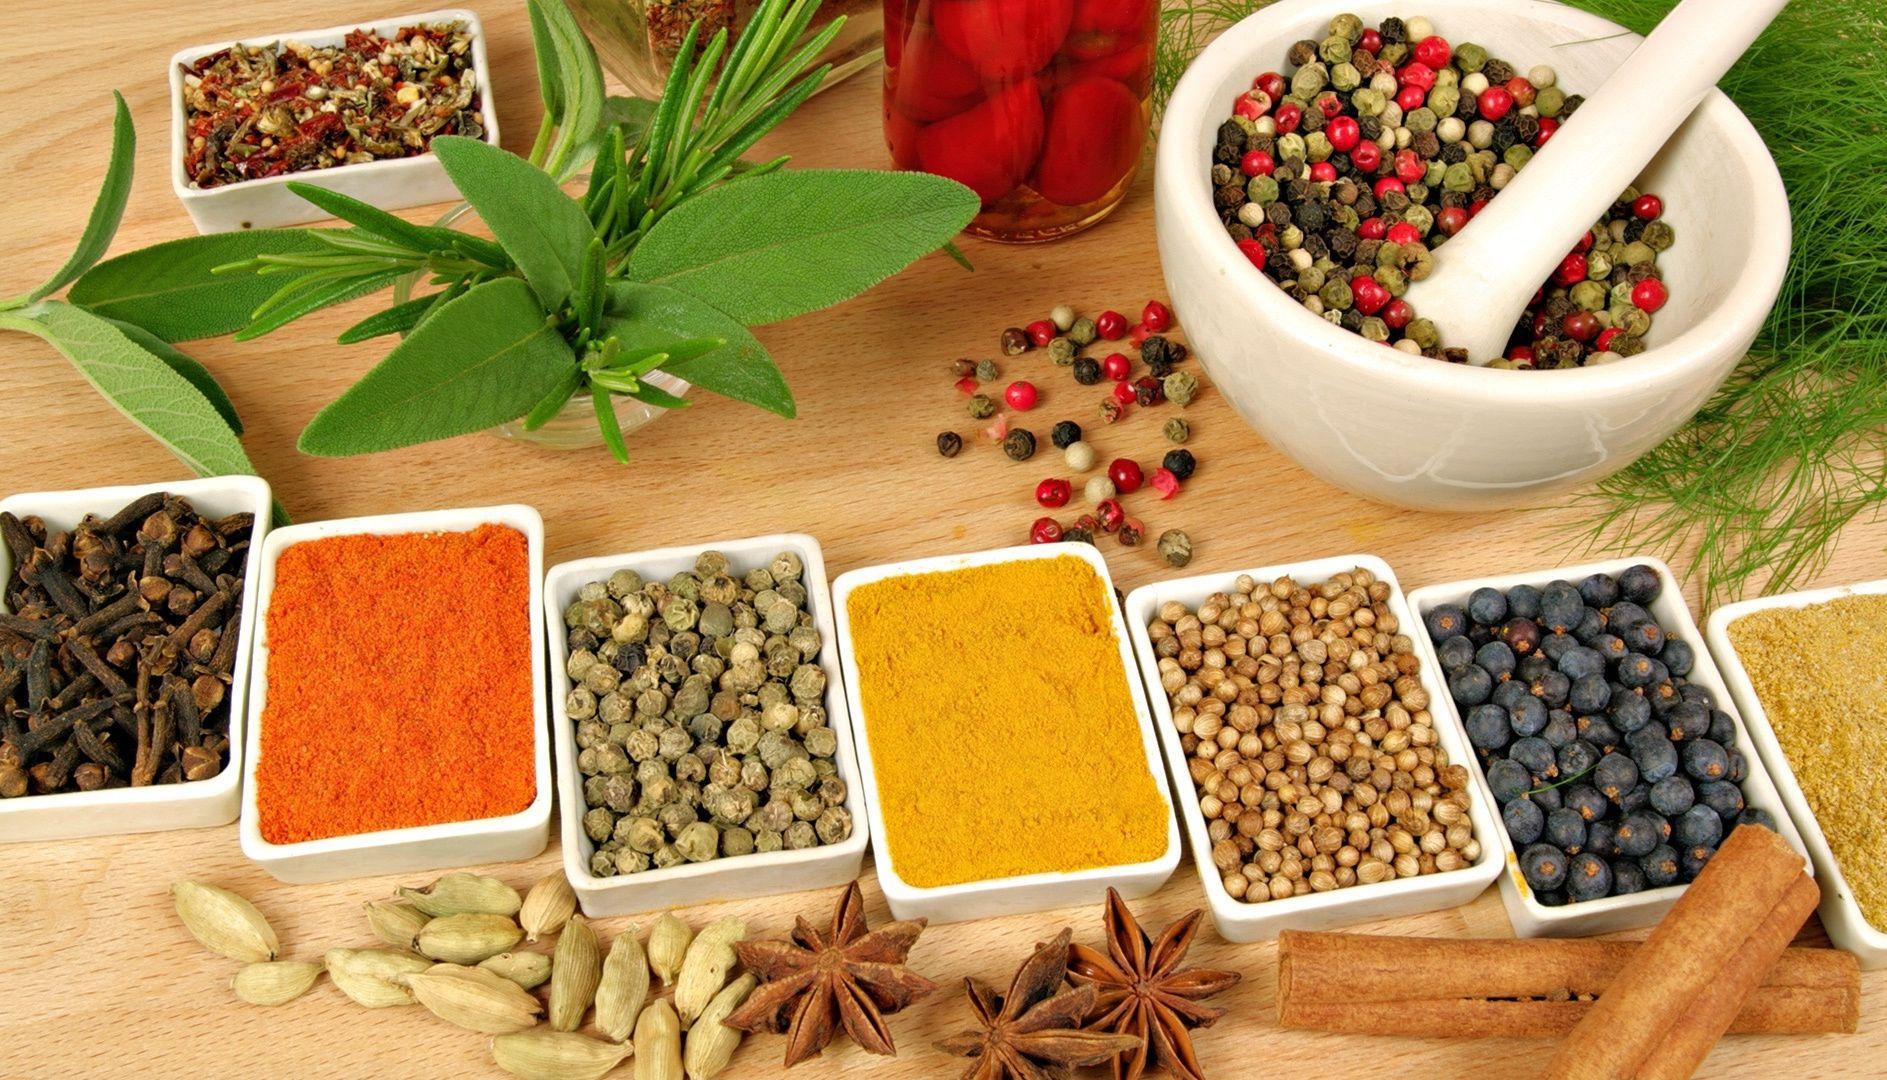 for Ayurvedic healing cuisine